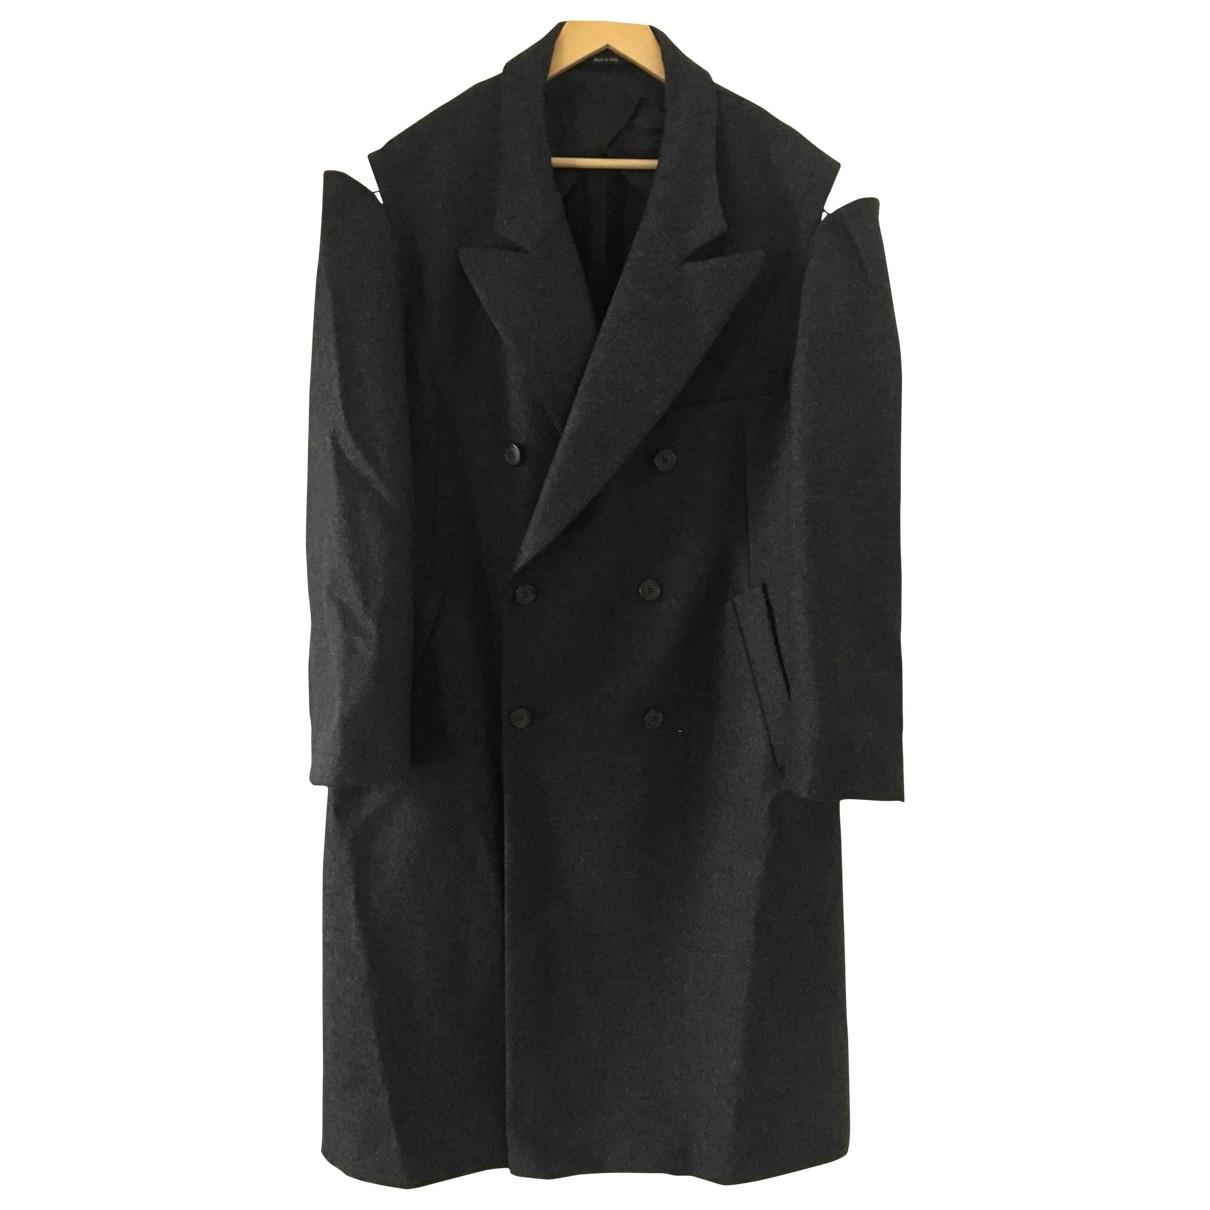 Maison Martin Margiela \N Anthracite Wool coat for Women 42 IT